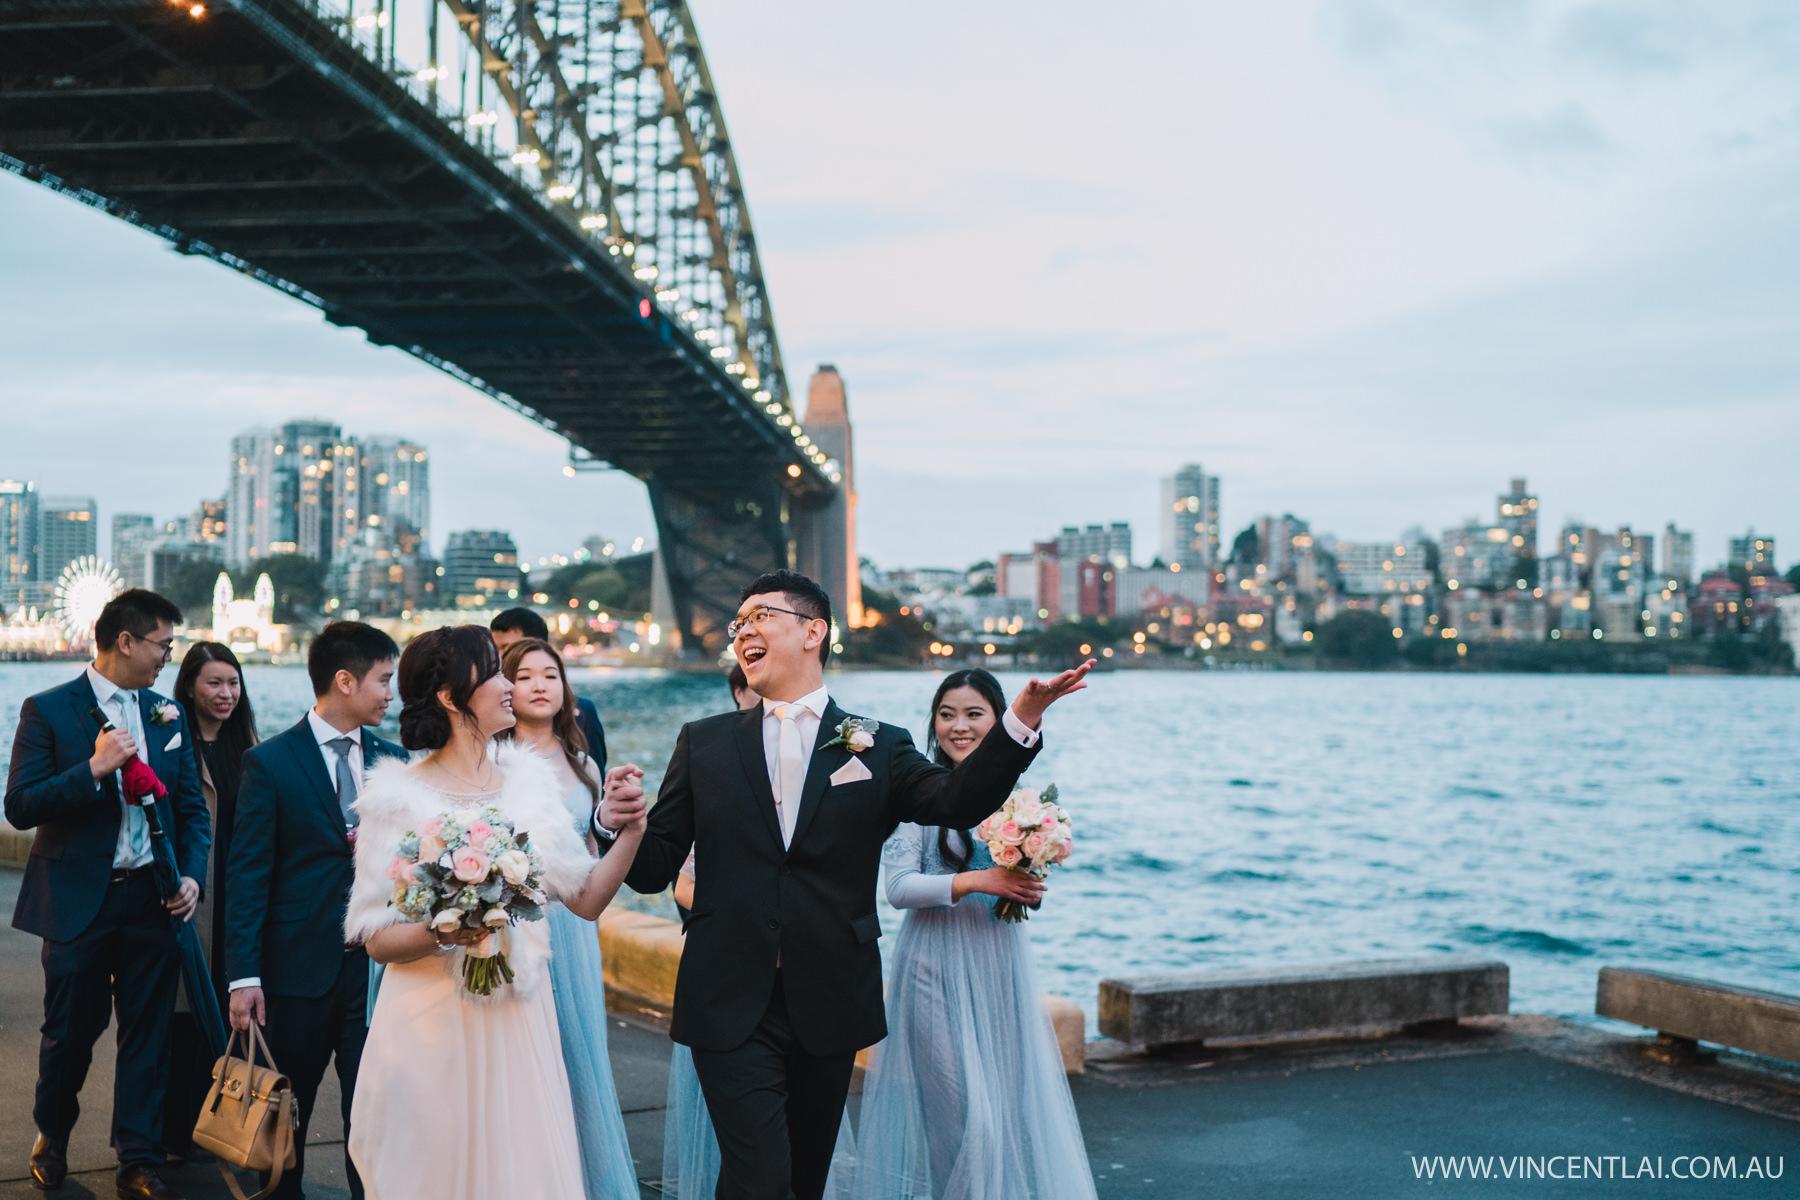 Vincent Lai Sydney Award Winning Wedding Photographer